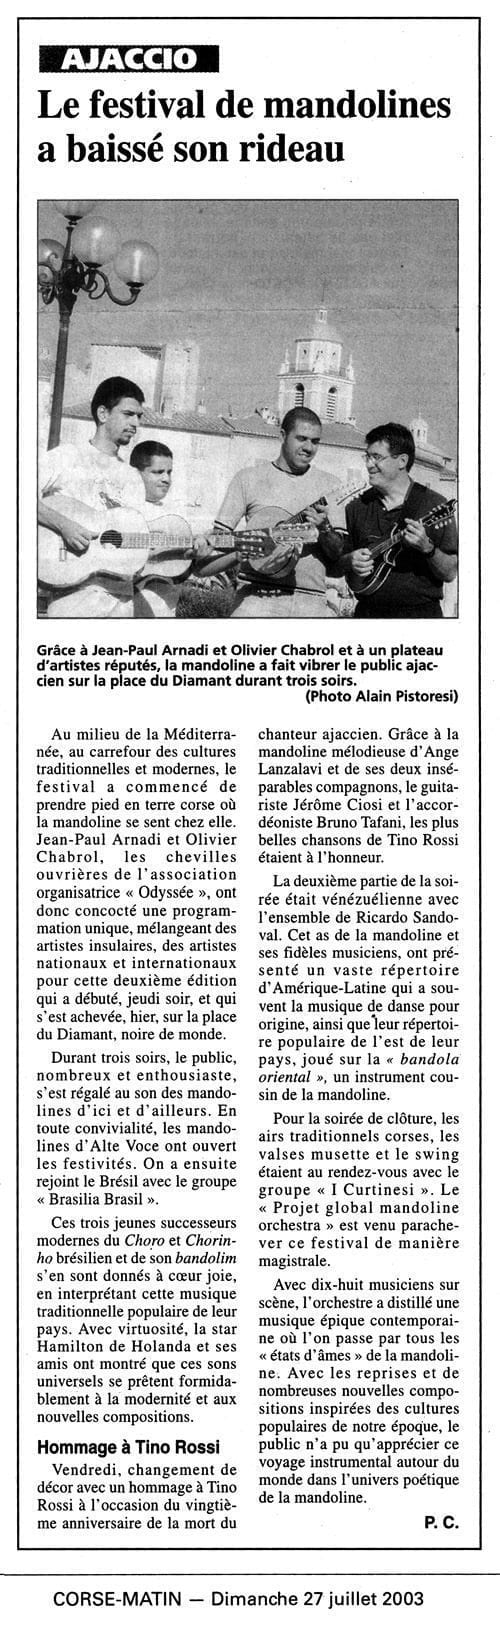 brasilia-brasil_franc%cc%a7a-jul-2003